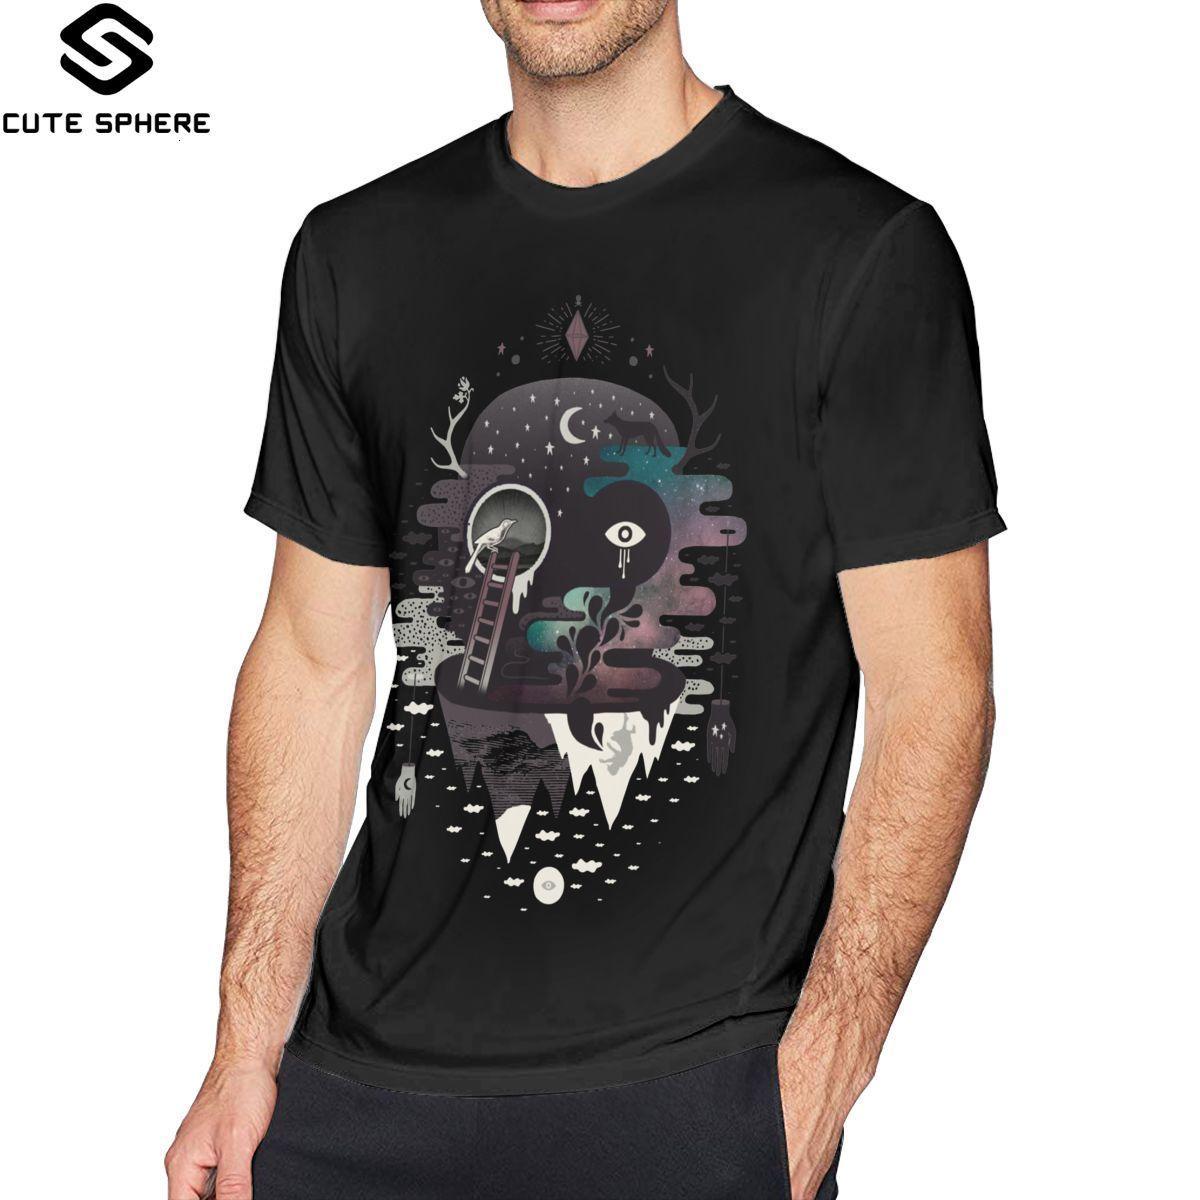 Daemon Camiseta T-shirt Daemon masculino bonito tshirt algodão de manga curta Imprimir Moda 5x Camiseta